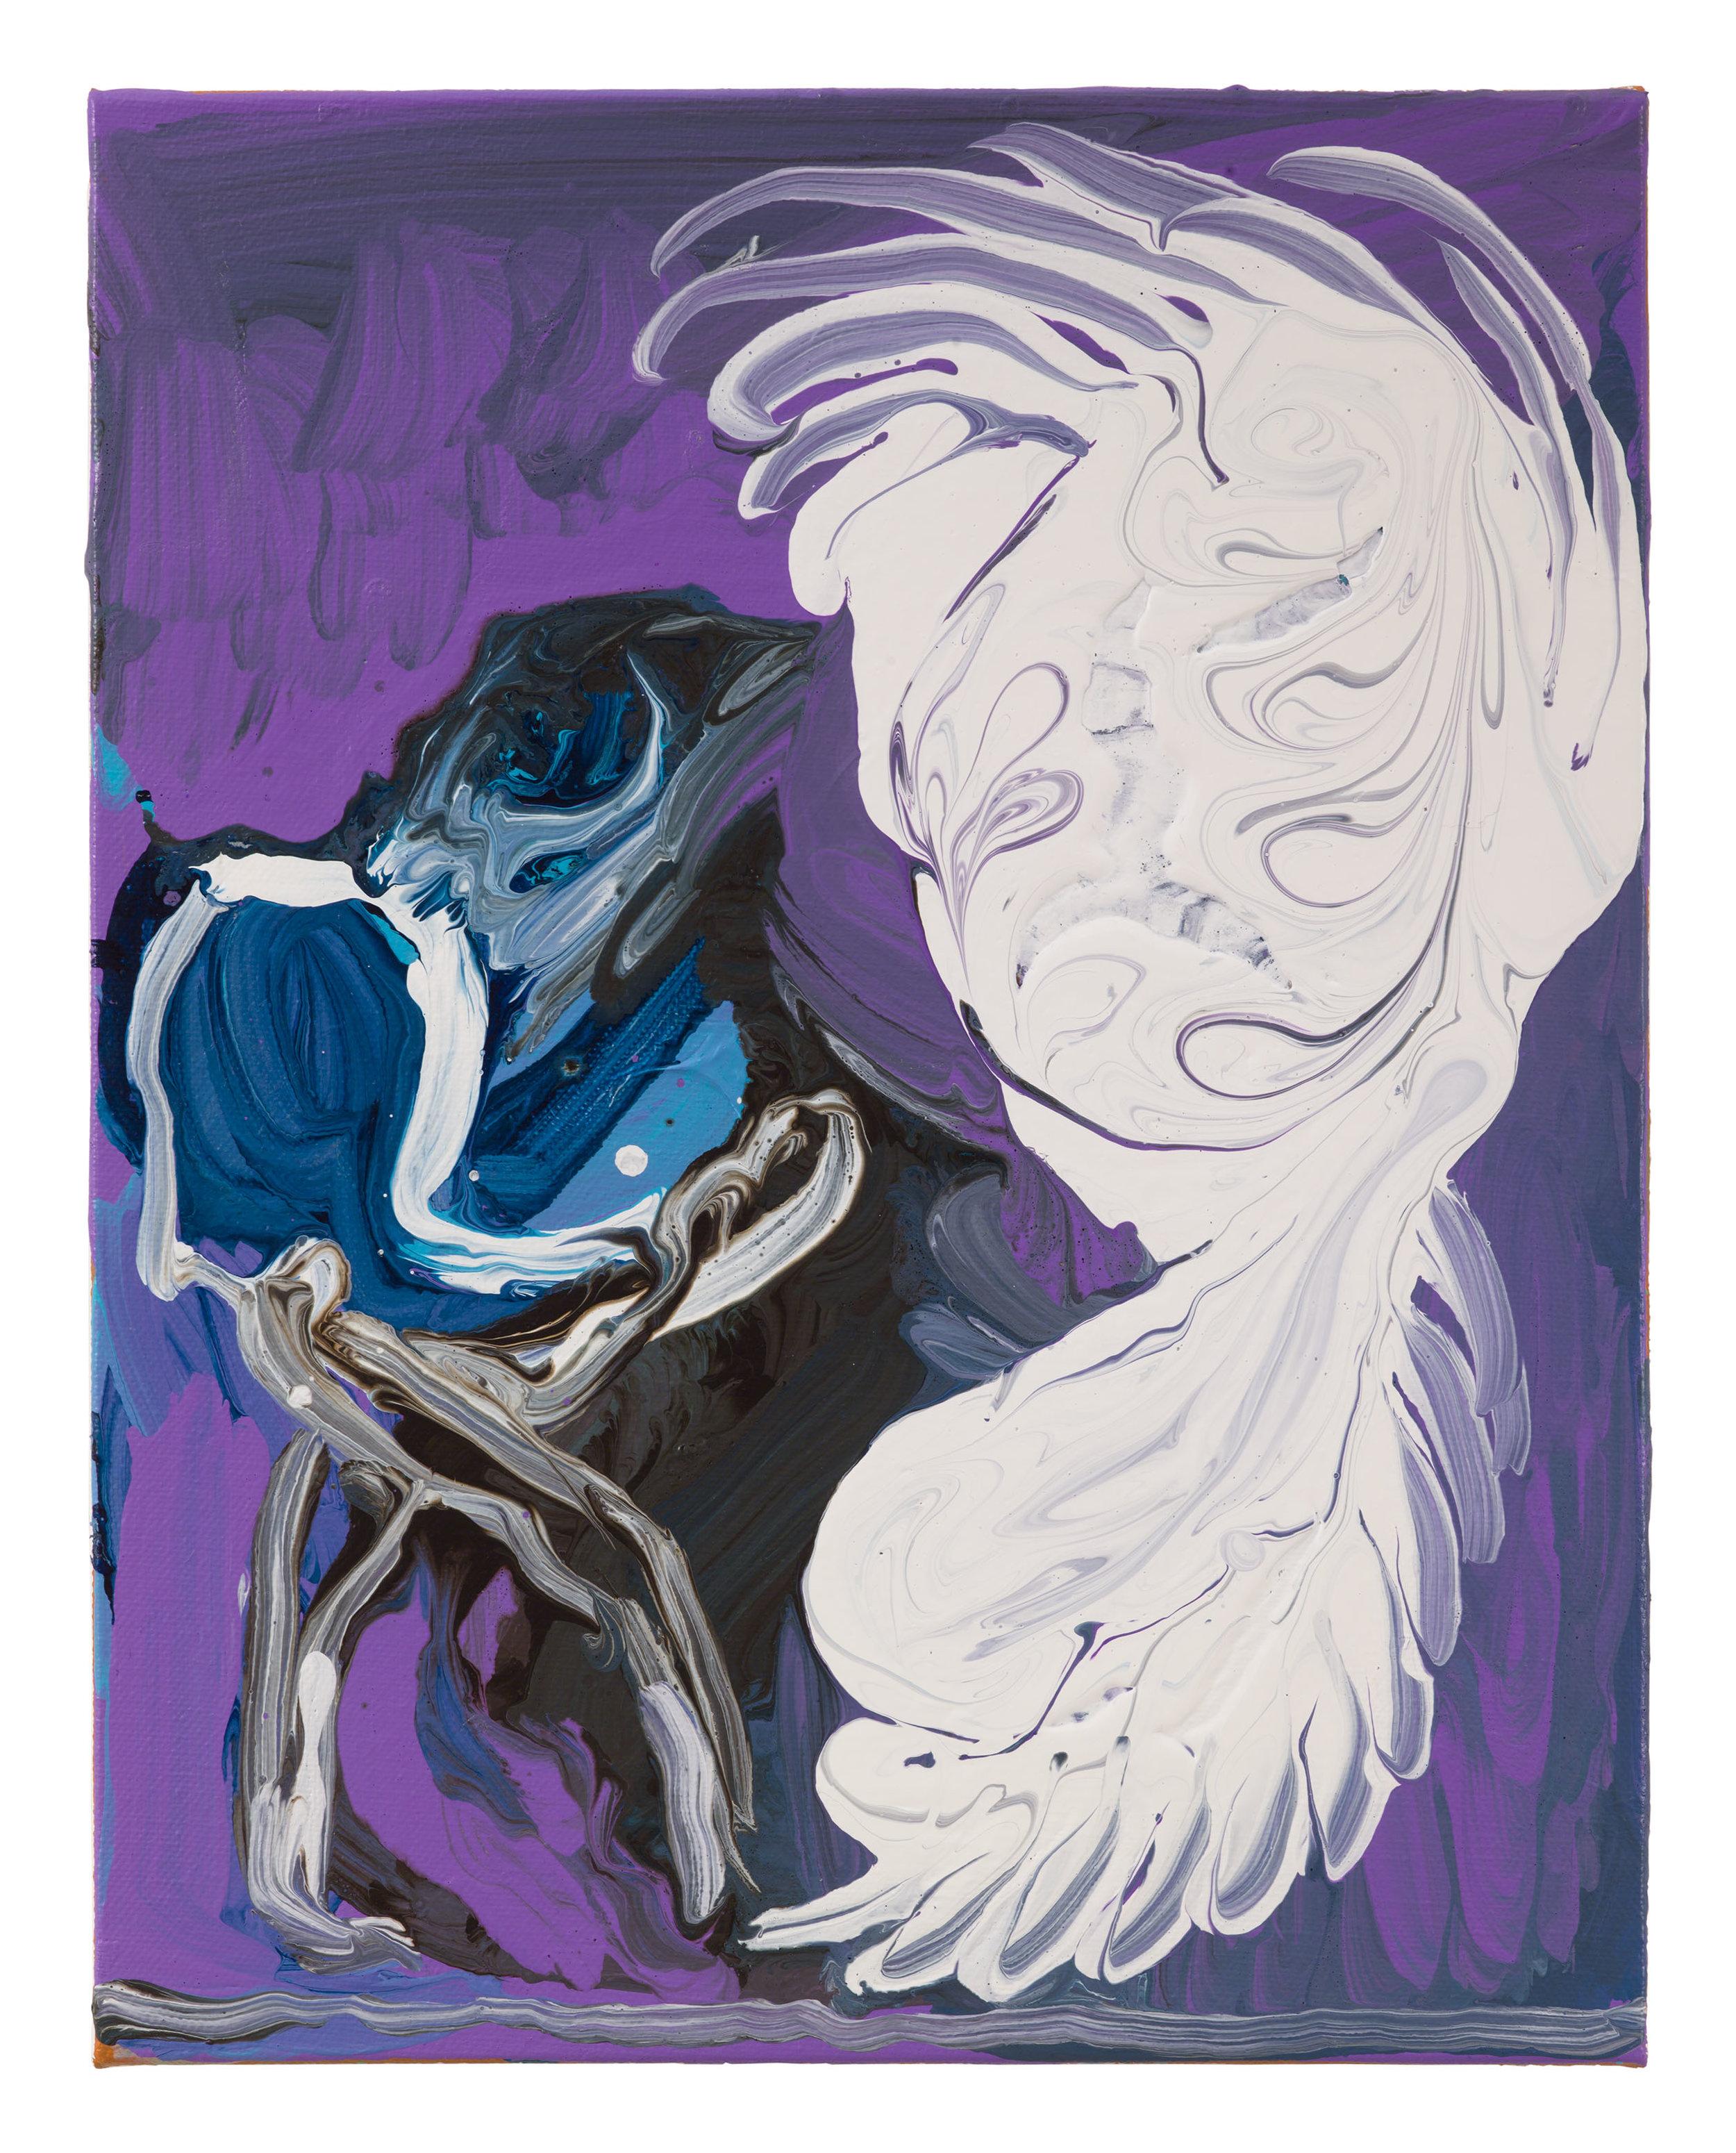 Drew Beattie  The Couple  2017 acrylic on canvas 14 x 11 inches